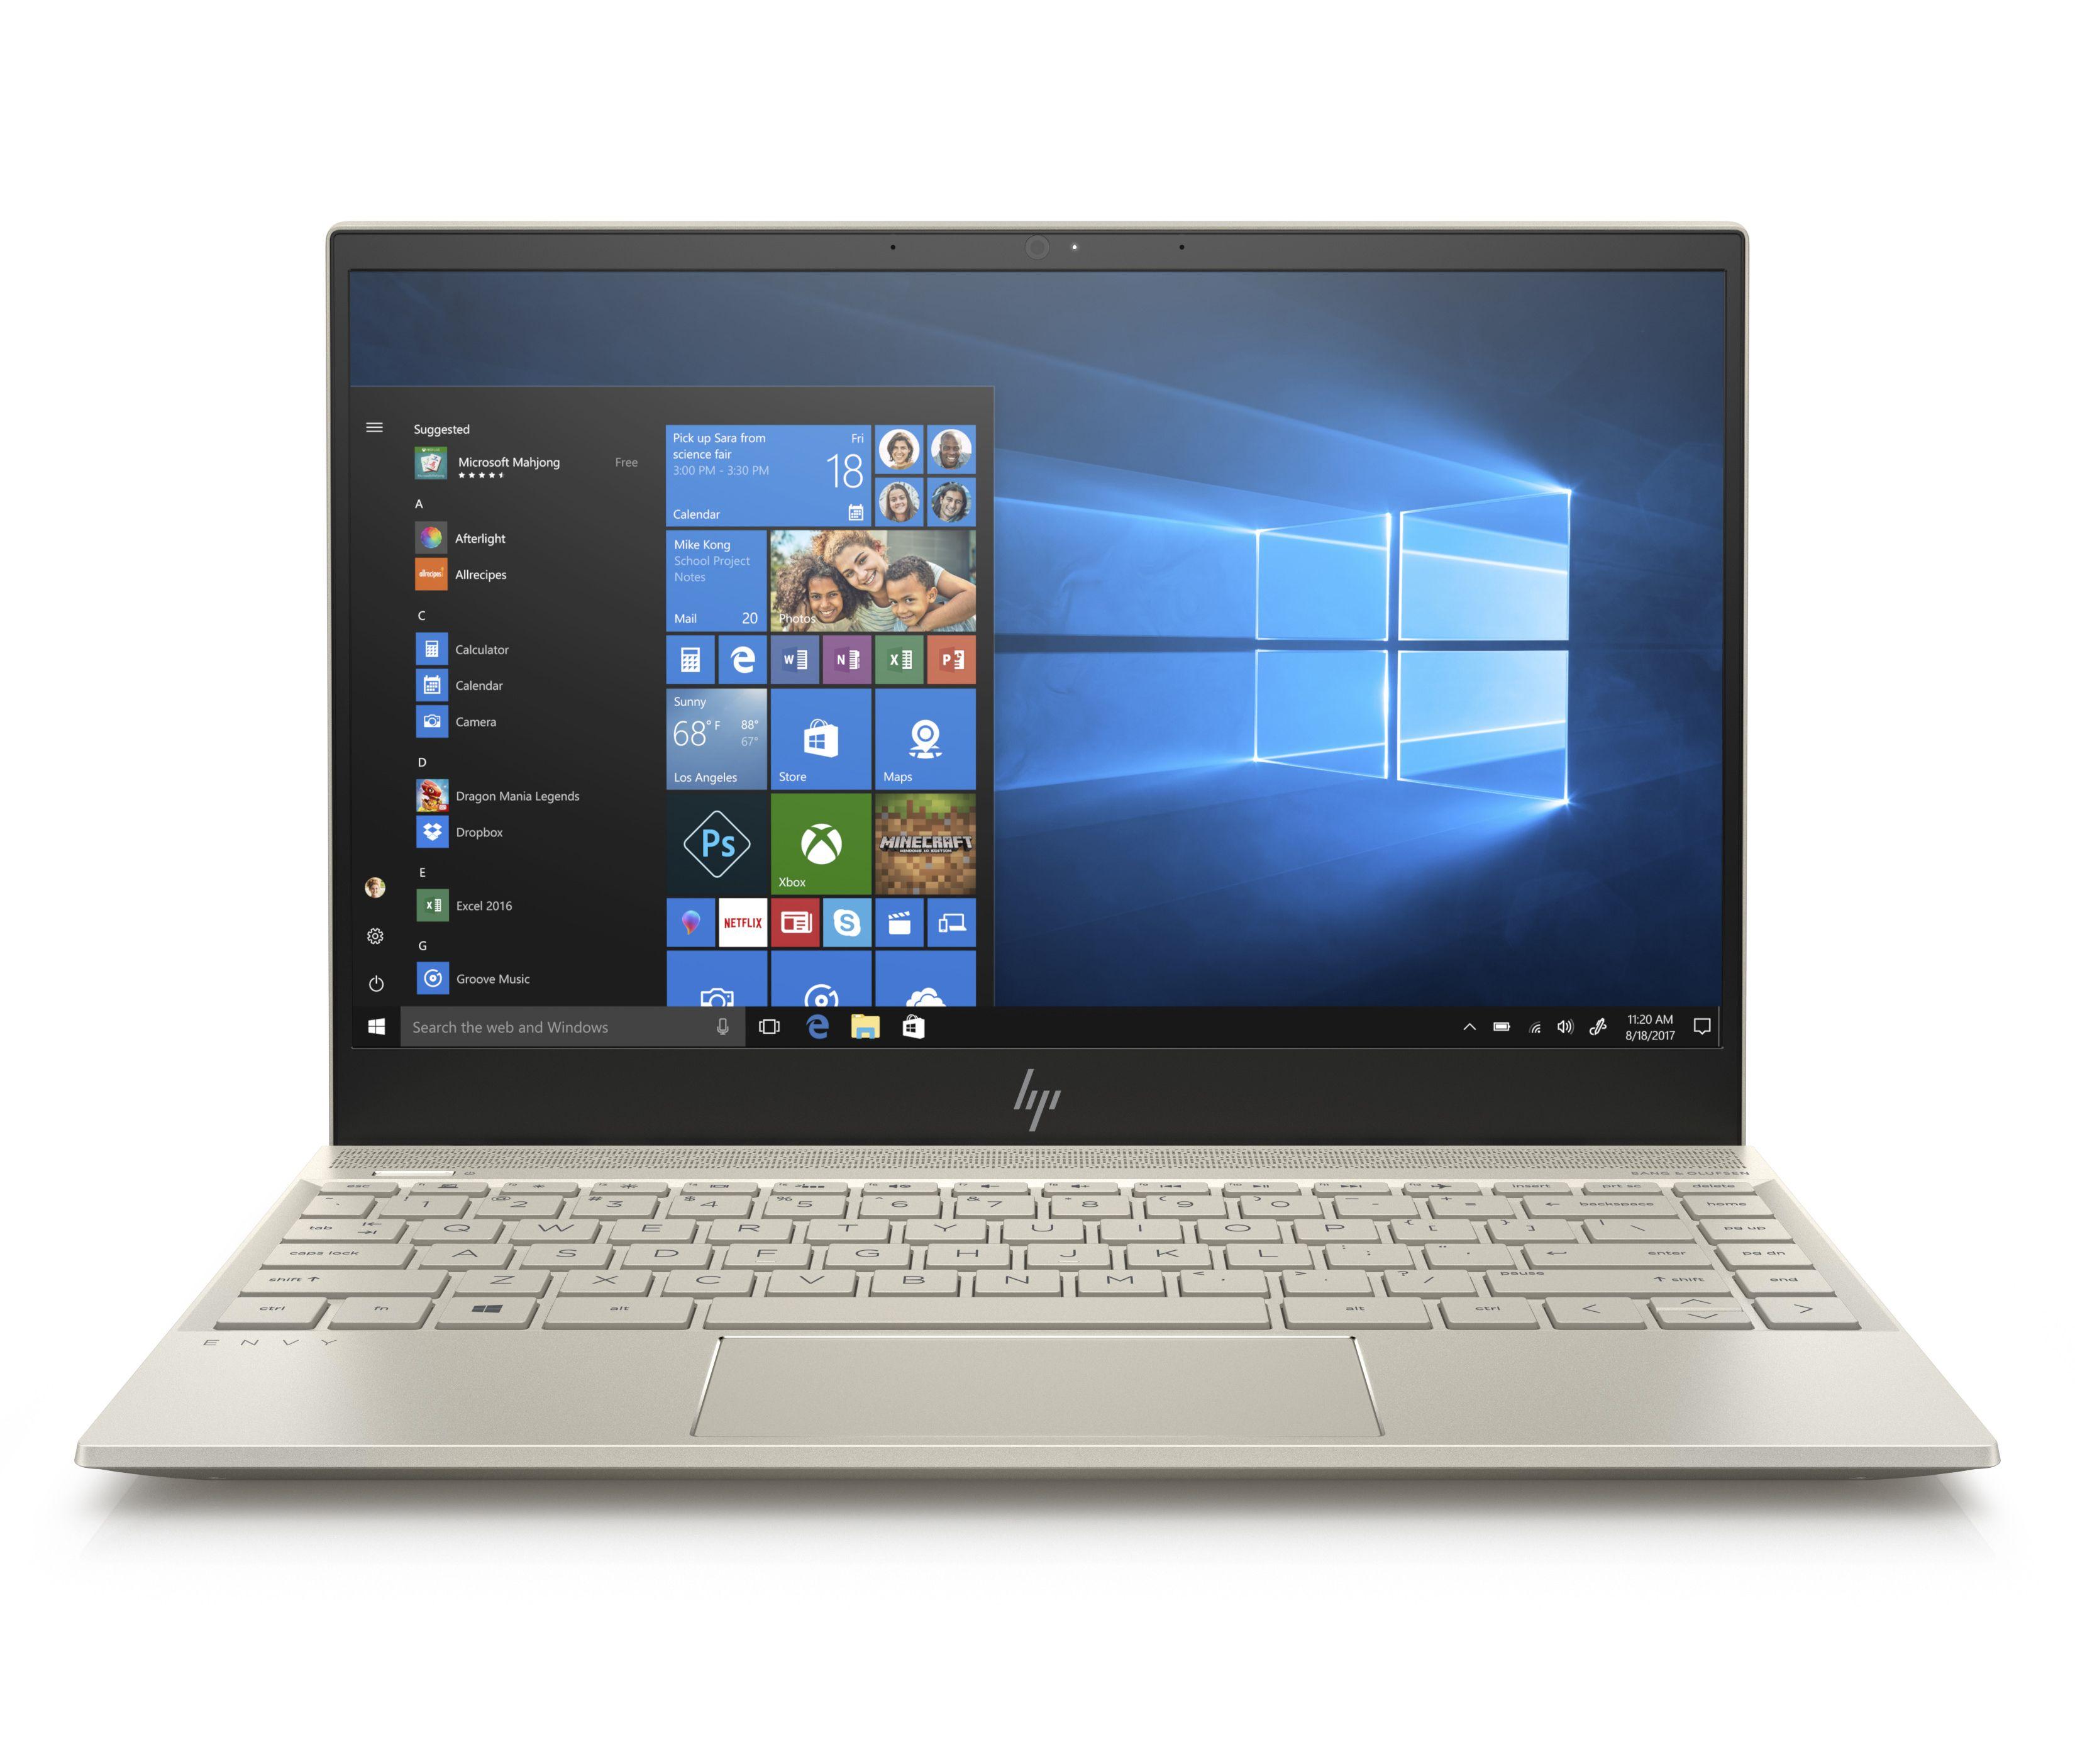 Hp Envy 13 3 Fhd Intel Core I5 8250u 8gb Sdram 256gb Ssd 13 Ah0051wm Walmart Com Hp Laptop Laptop Price Probook